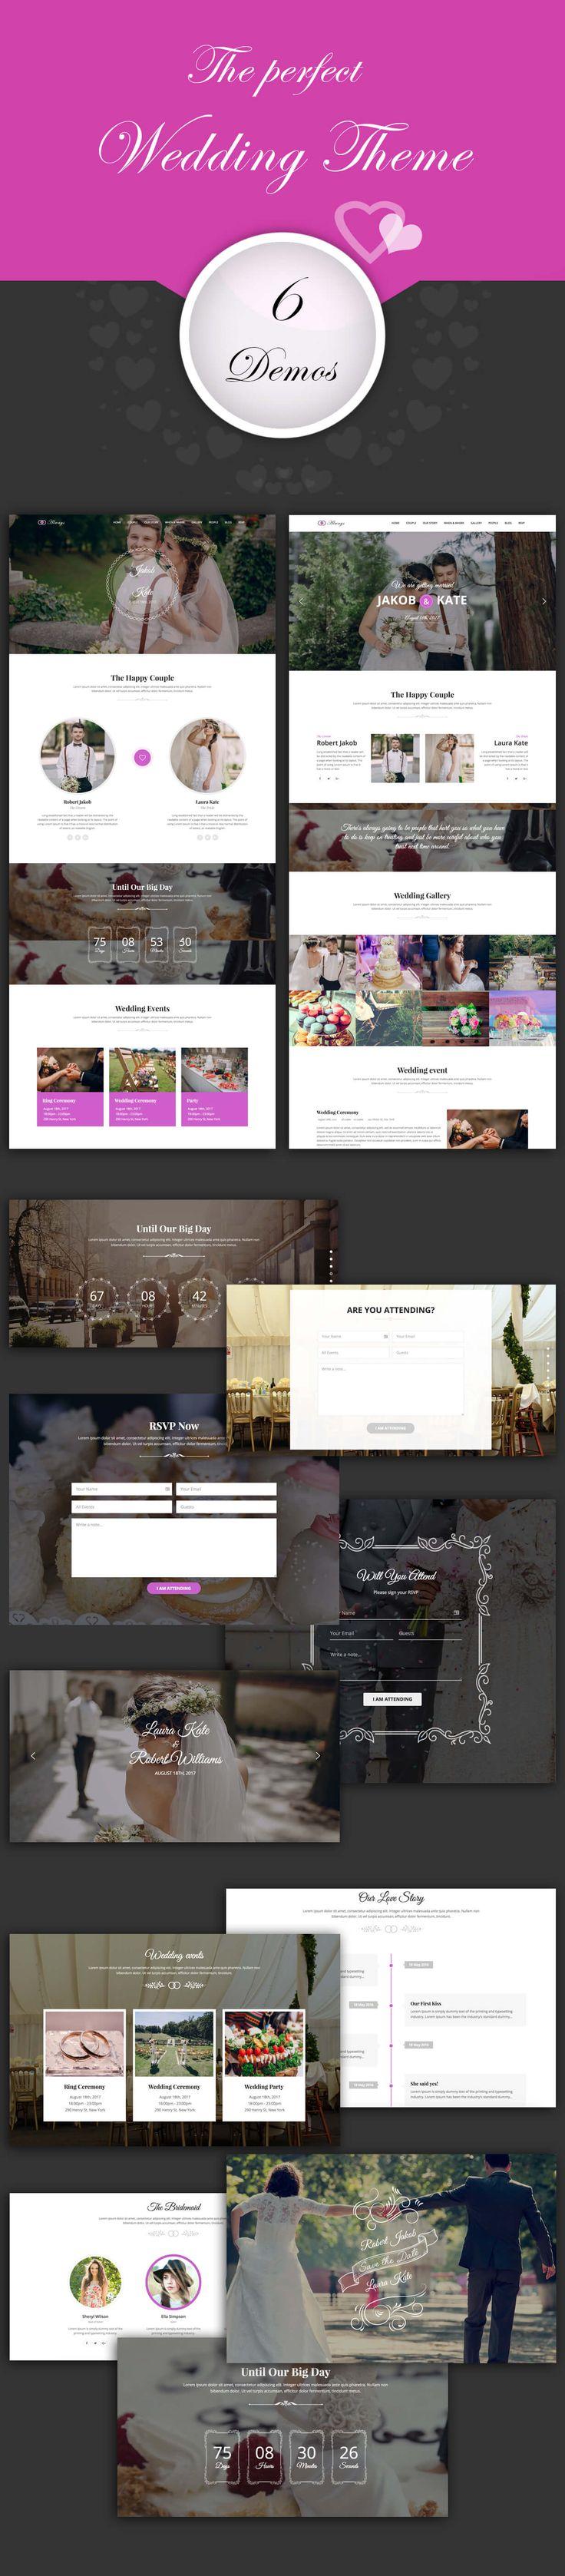 Always - Responsive WordPress Wedding Theme #wedding planner